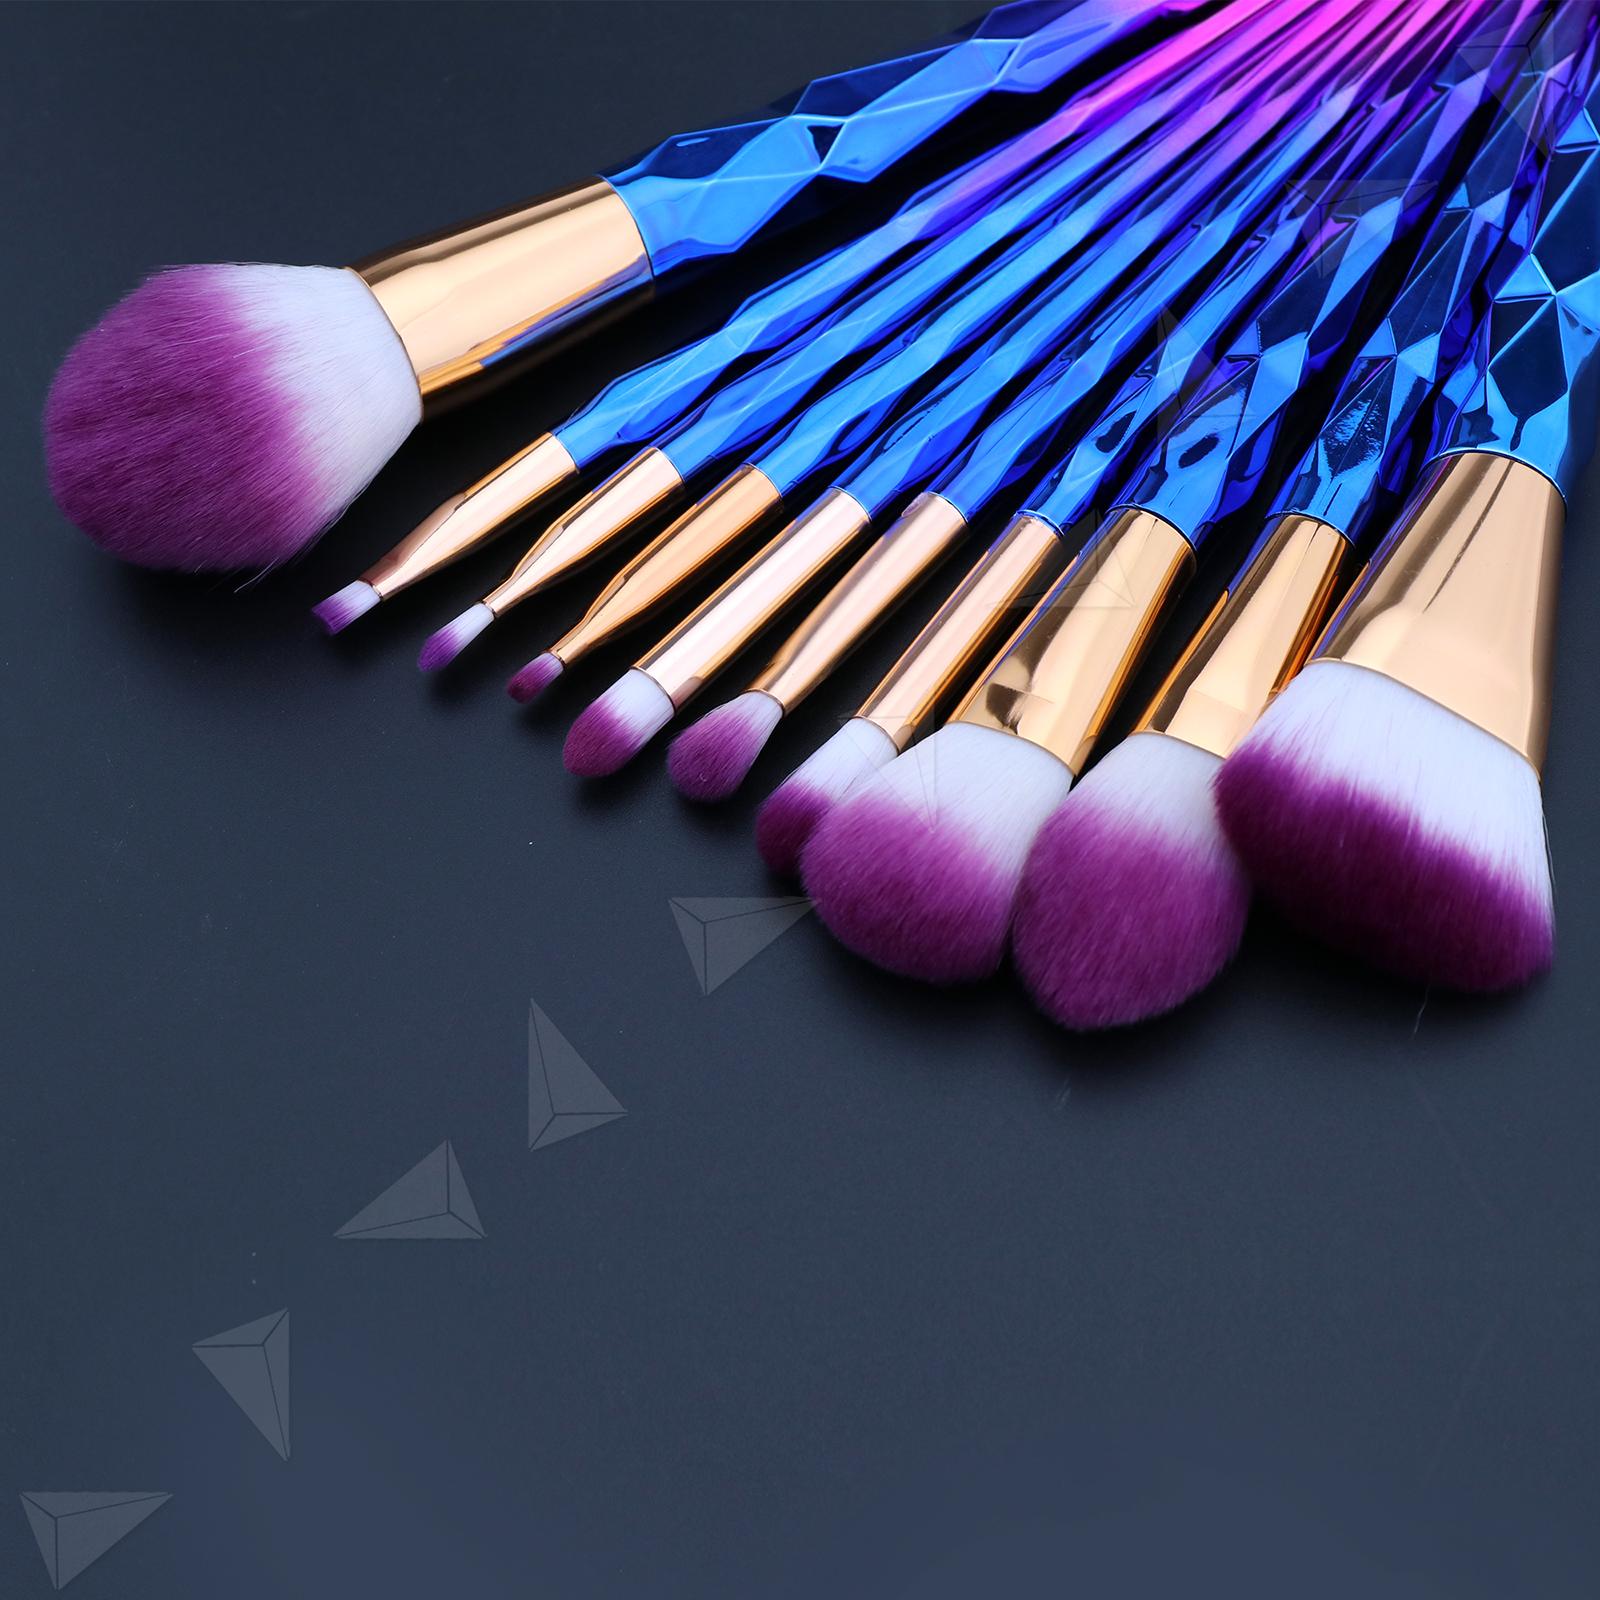 10tlg make up pinsel set kosmetik brushes schminkpinsel cosmetic beauty ebay. Black Bedroom Furniture Sets. Home Design Ideas